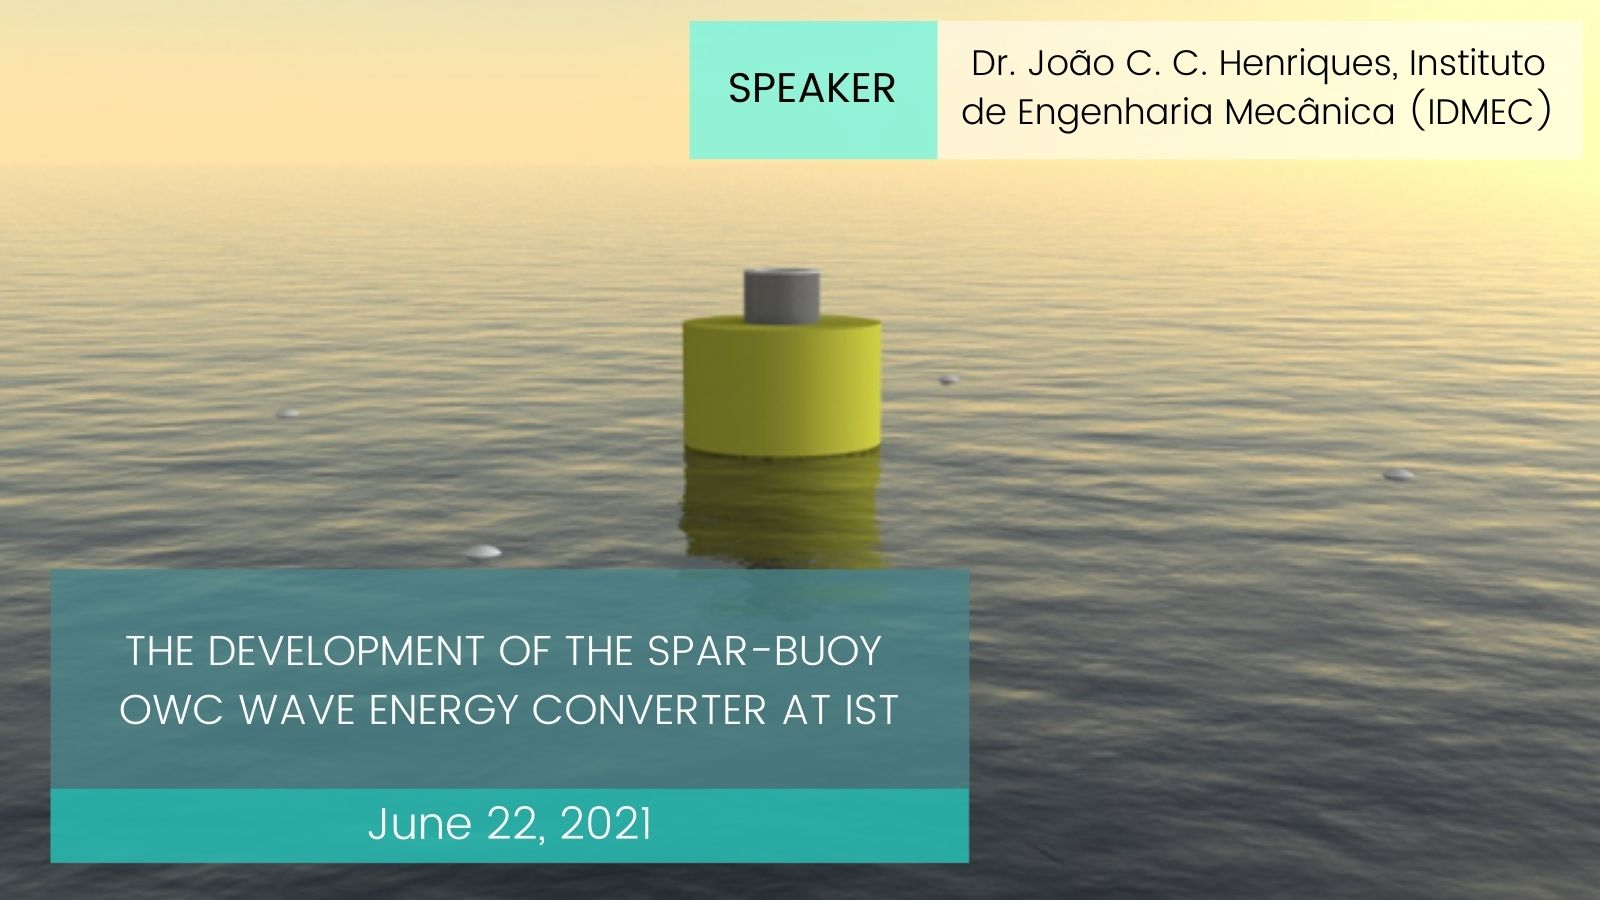 spar-buoy OWC wave energy converter